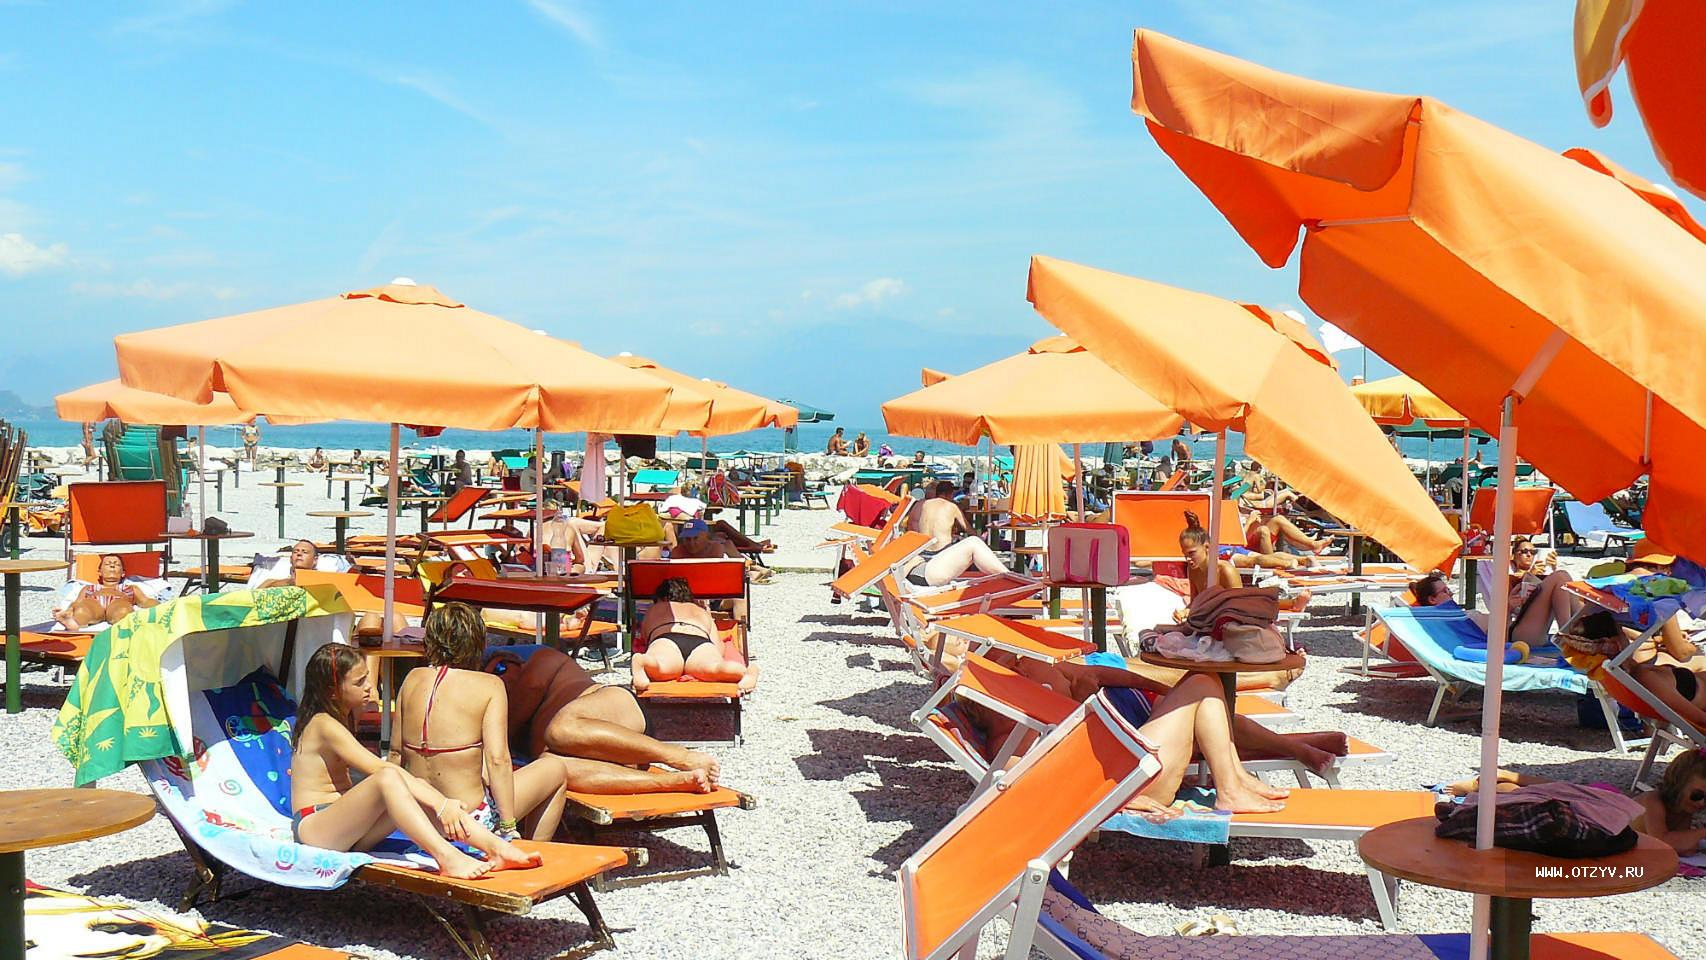 Meteo Garda in spiaggia ottobre